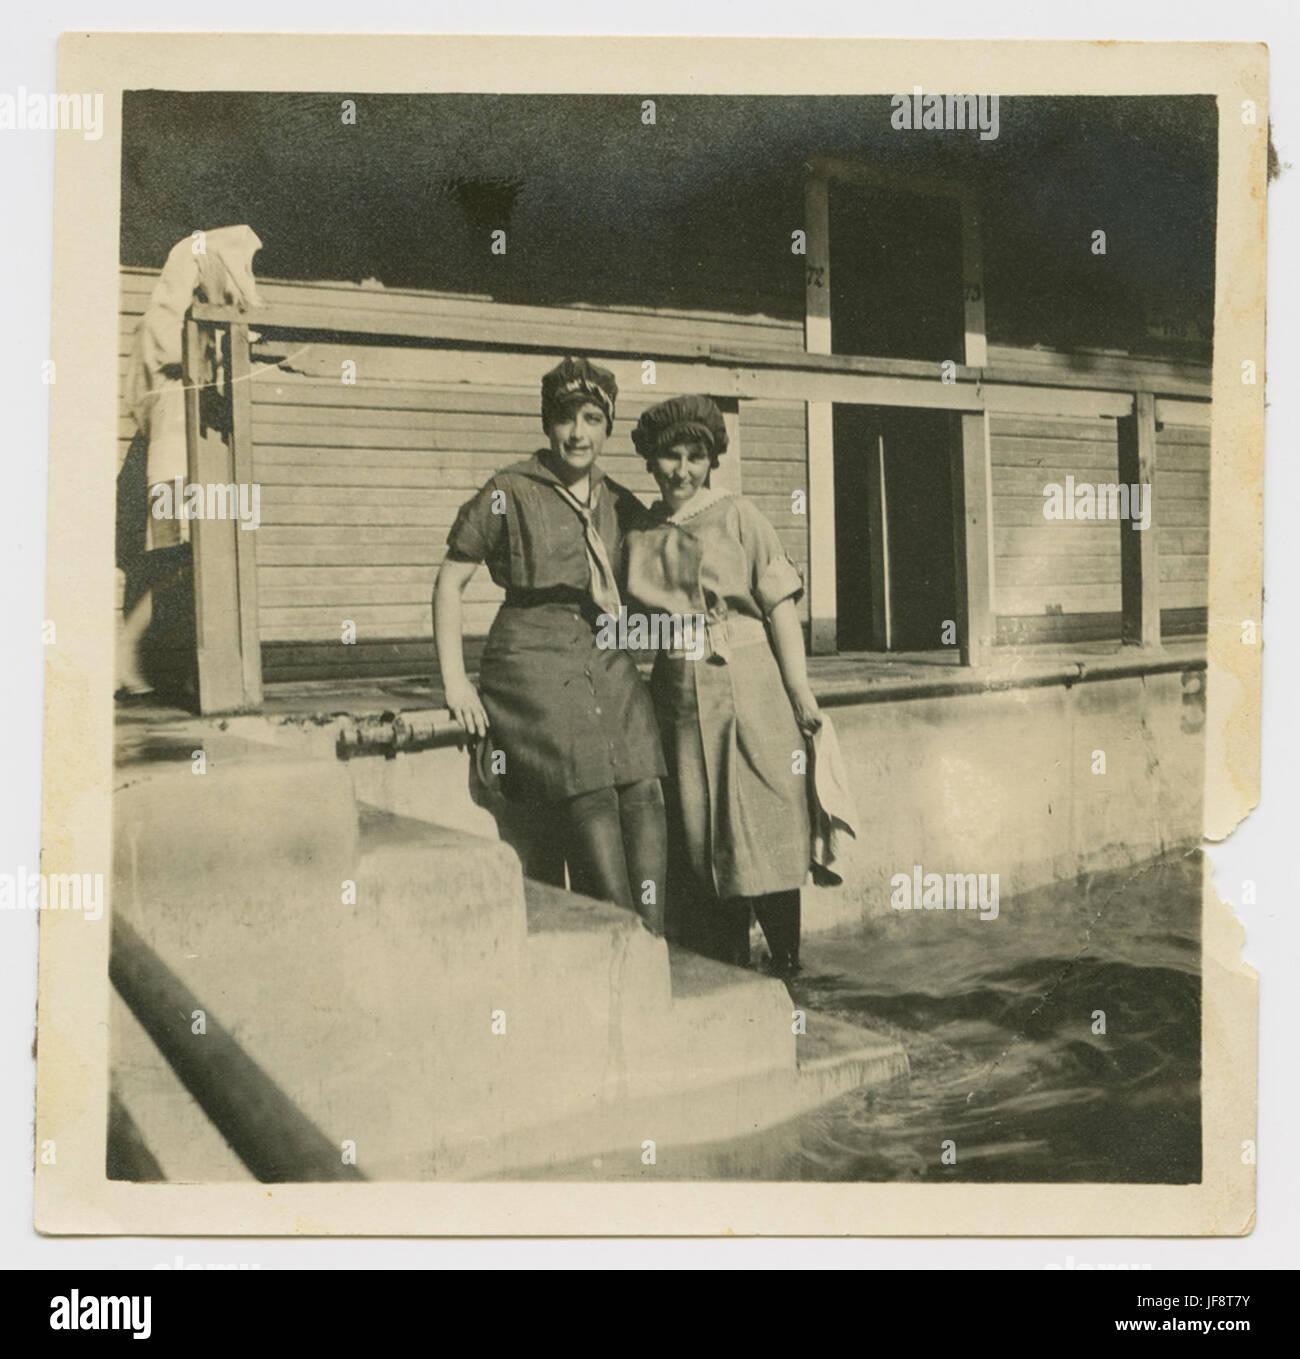 [Two Women in Bathing Costumes, Houston Heights Natatorium] 31729154413 o - Stock Image